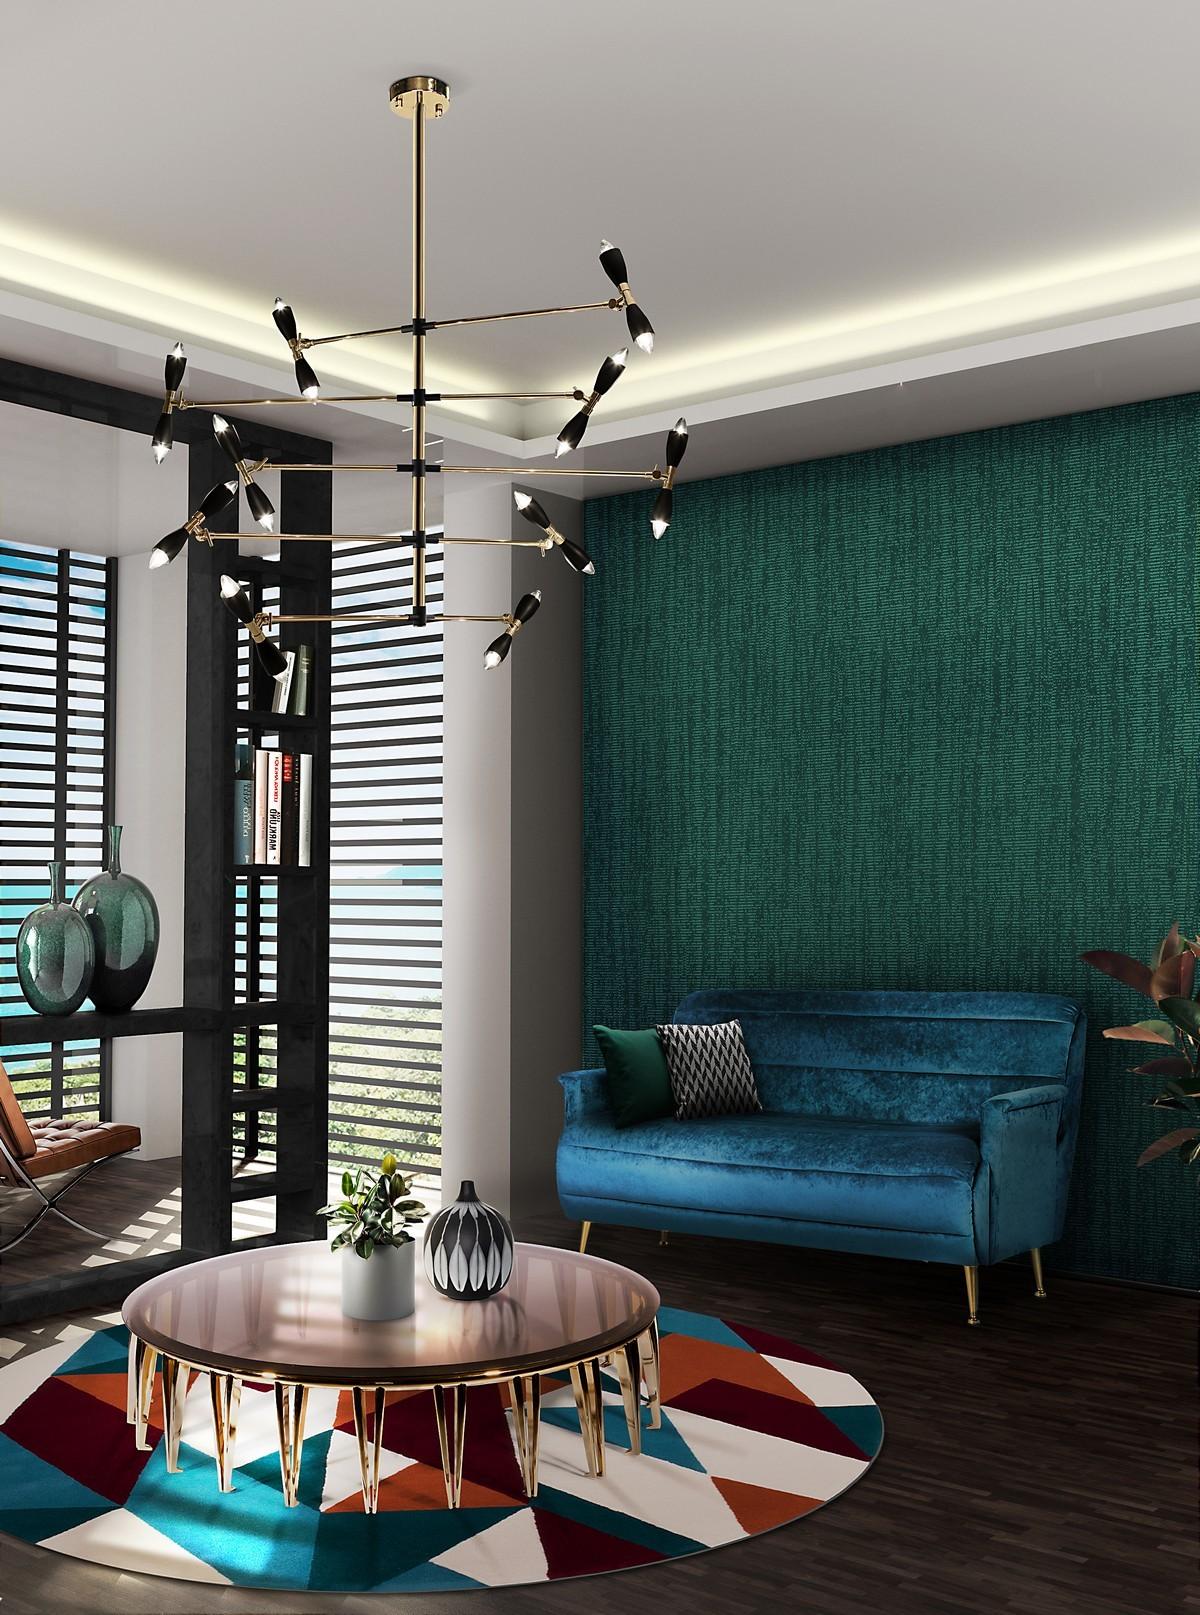 Exclusive Living Room Decor Inspirations (Part II)